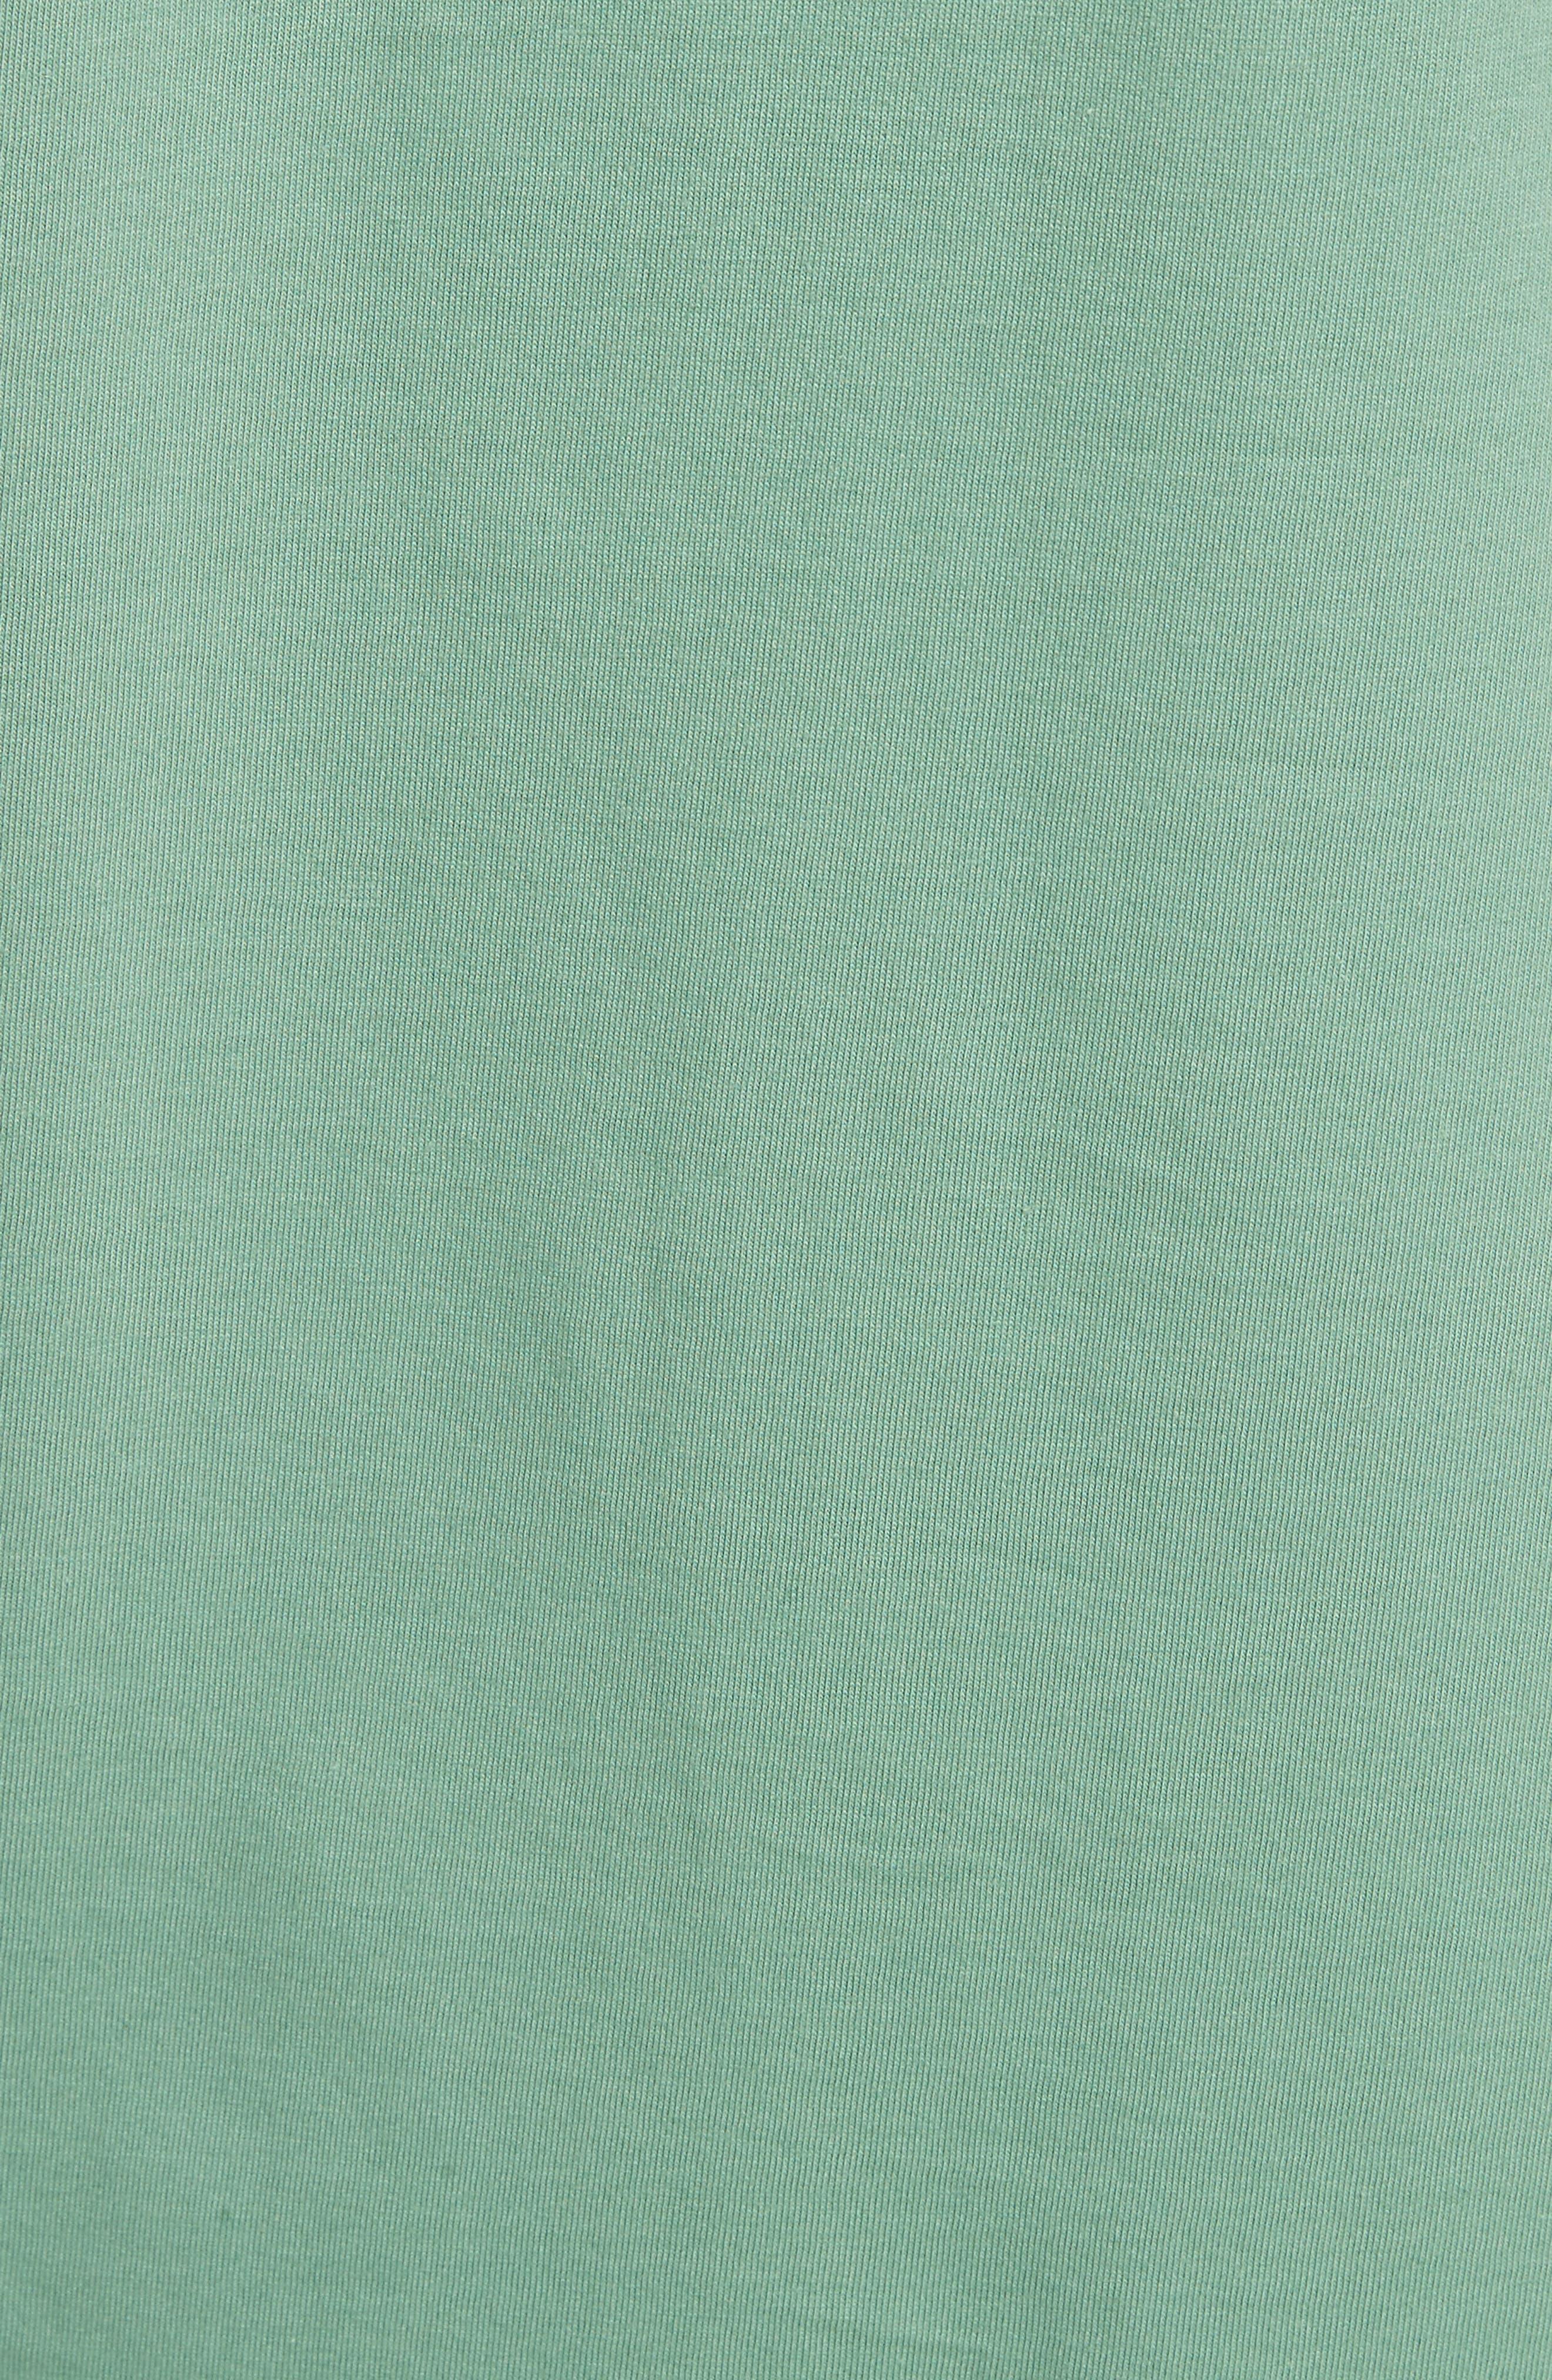 CARHARTT WORK IN PROGRESS,                             World Party T-Shirt,                             Alternate thumbnail 5, color,                             340